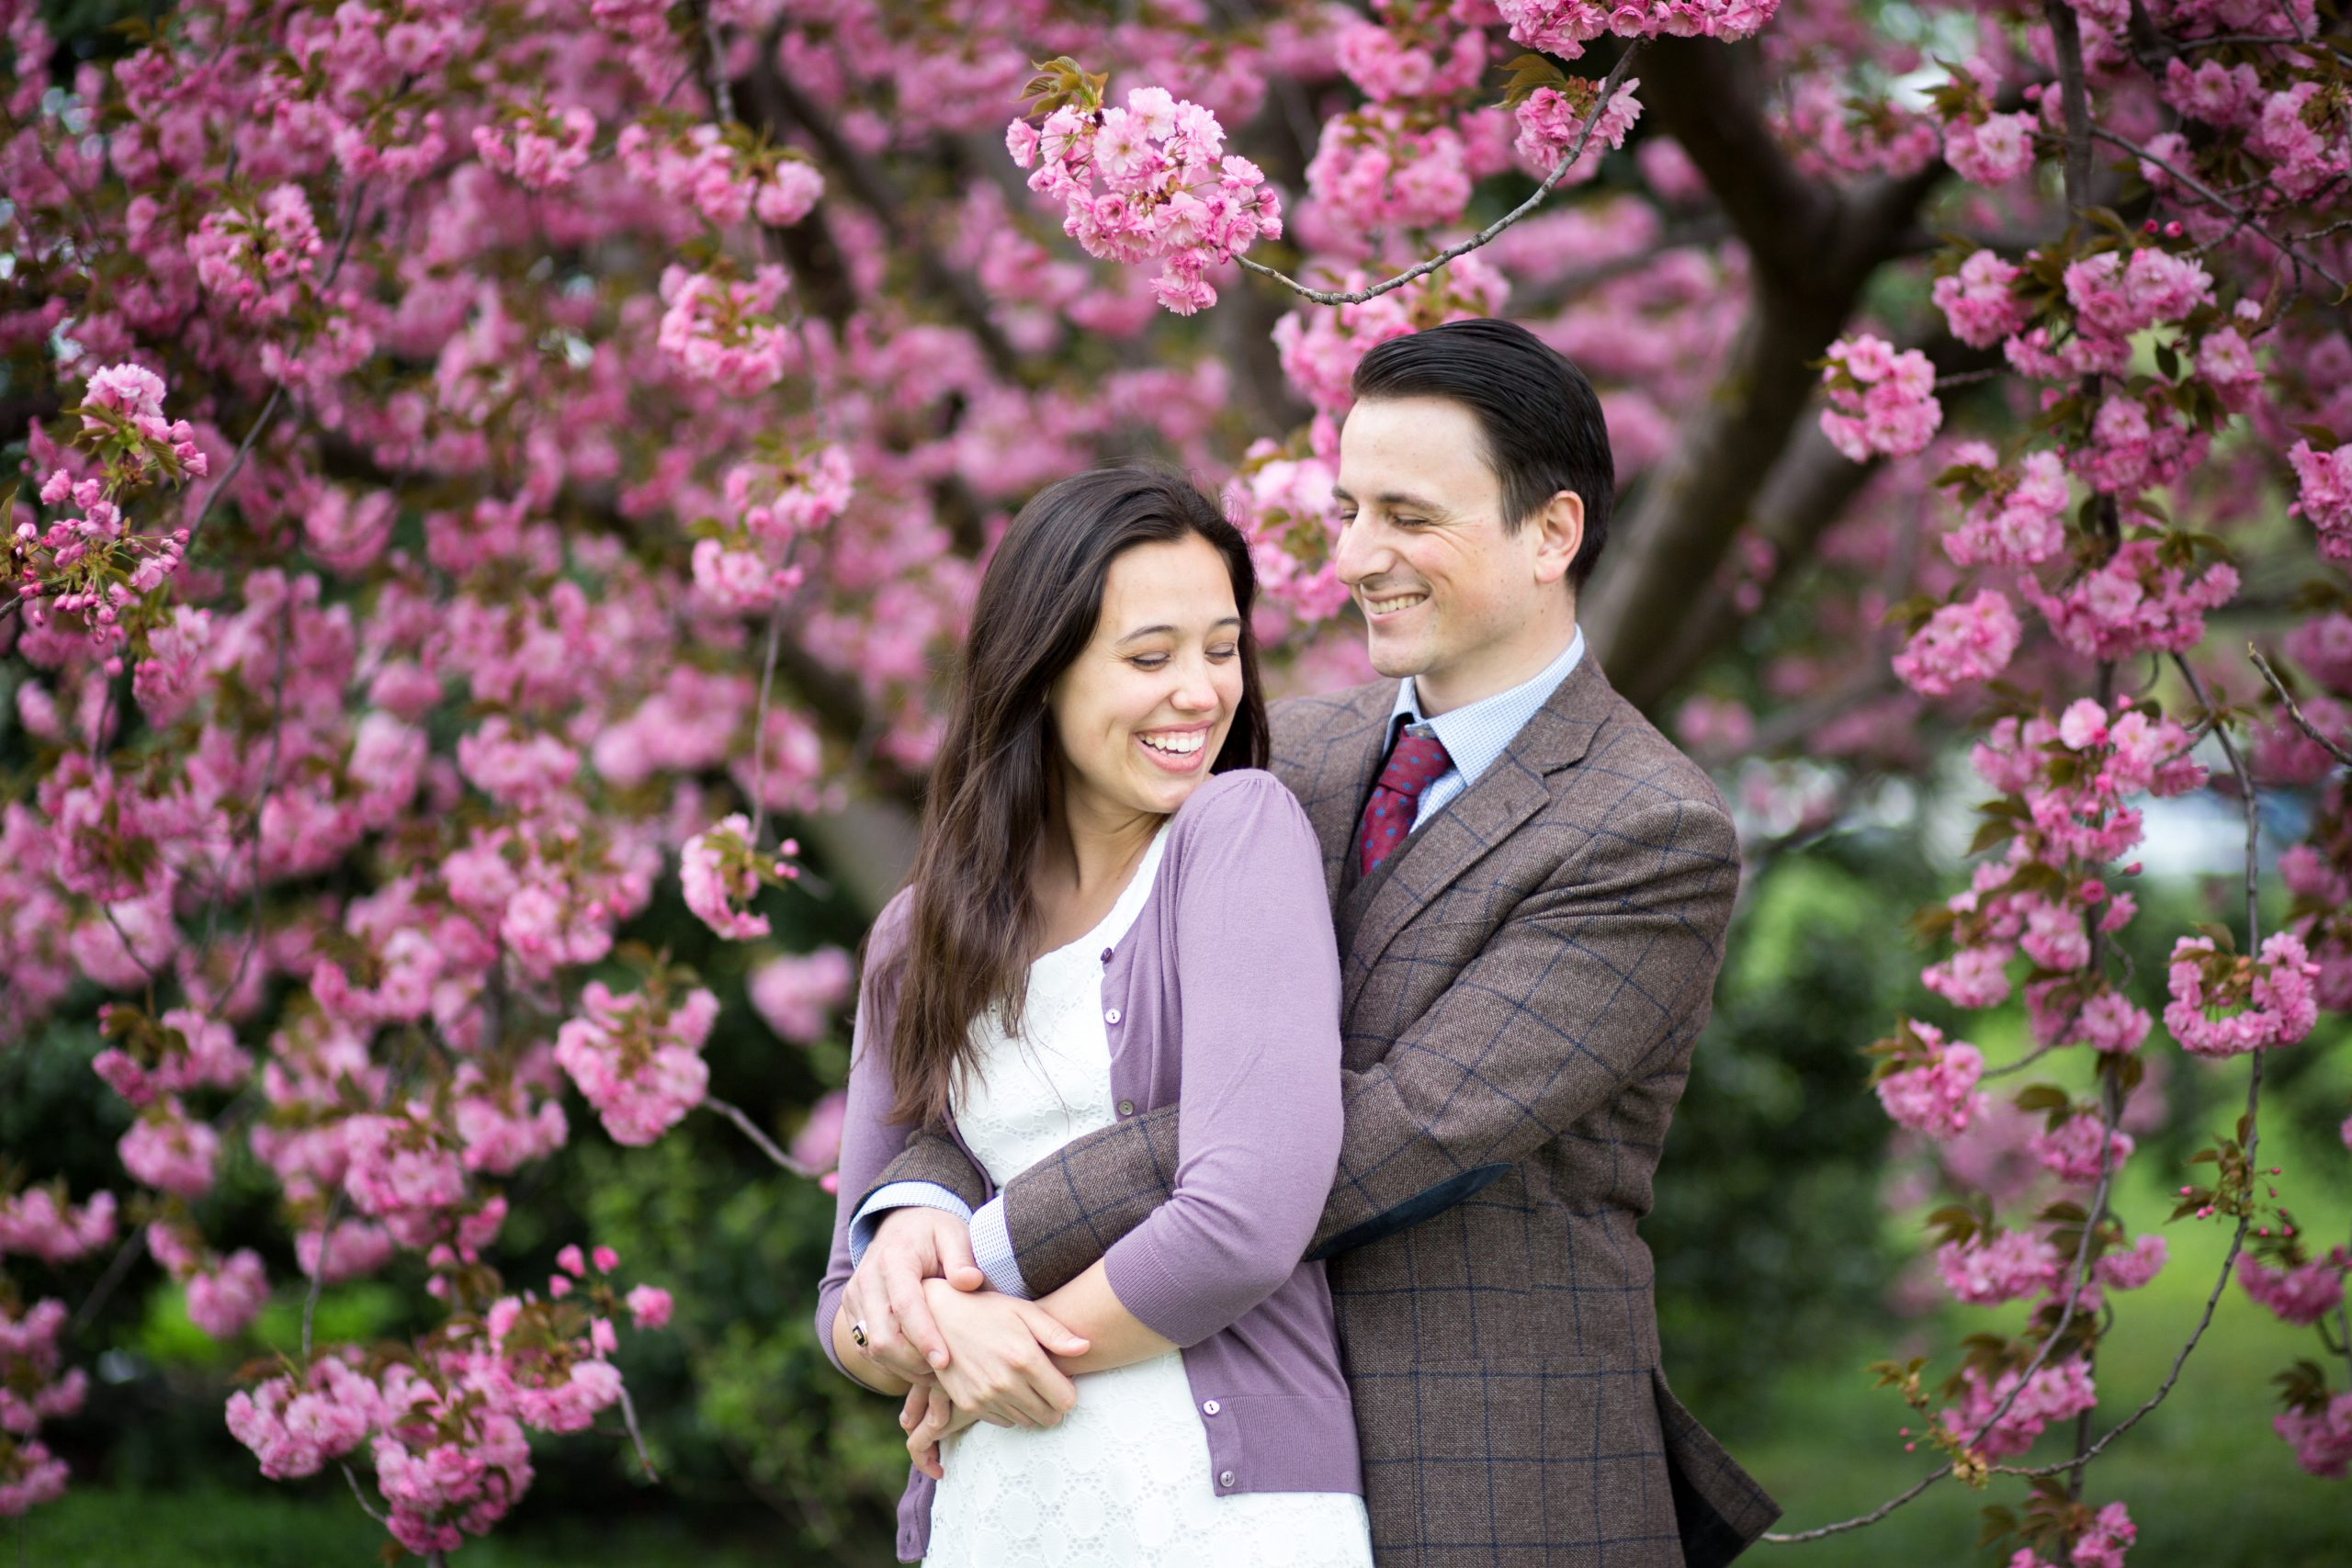 Lovesome Photography cherry blossom photos